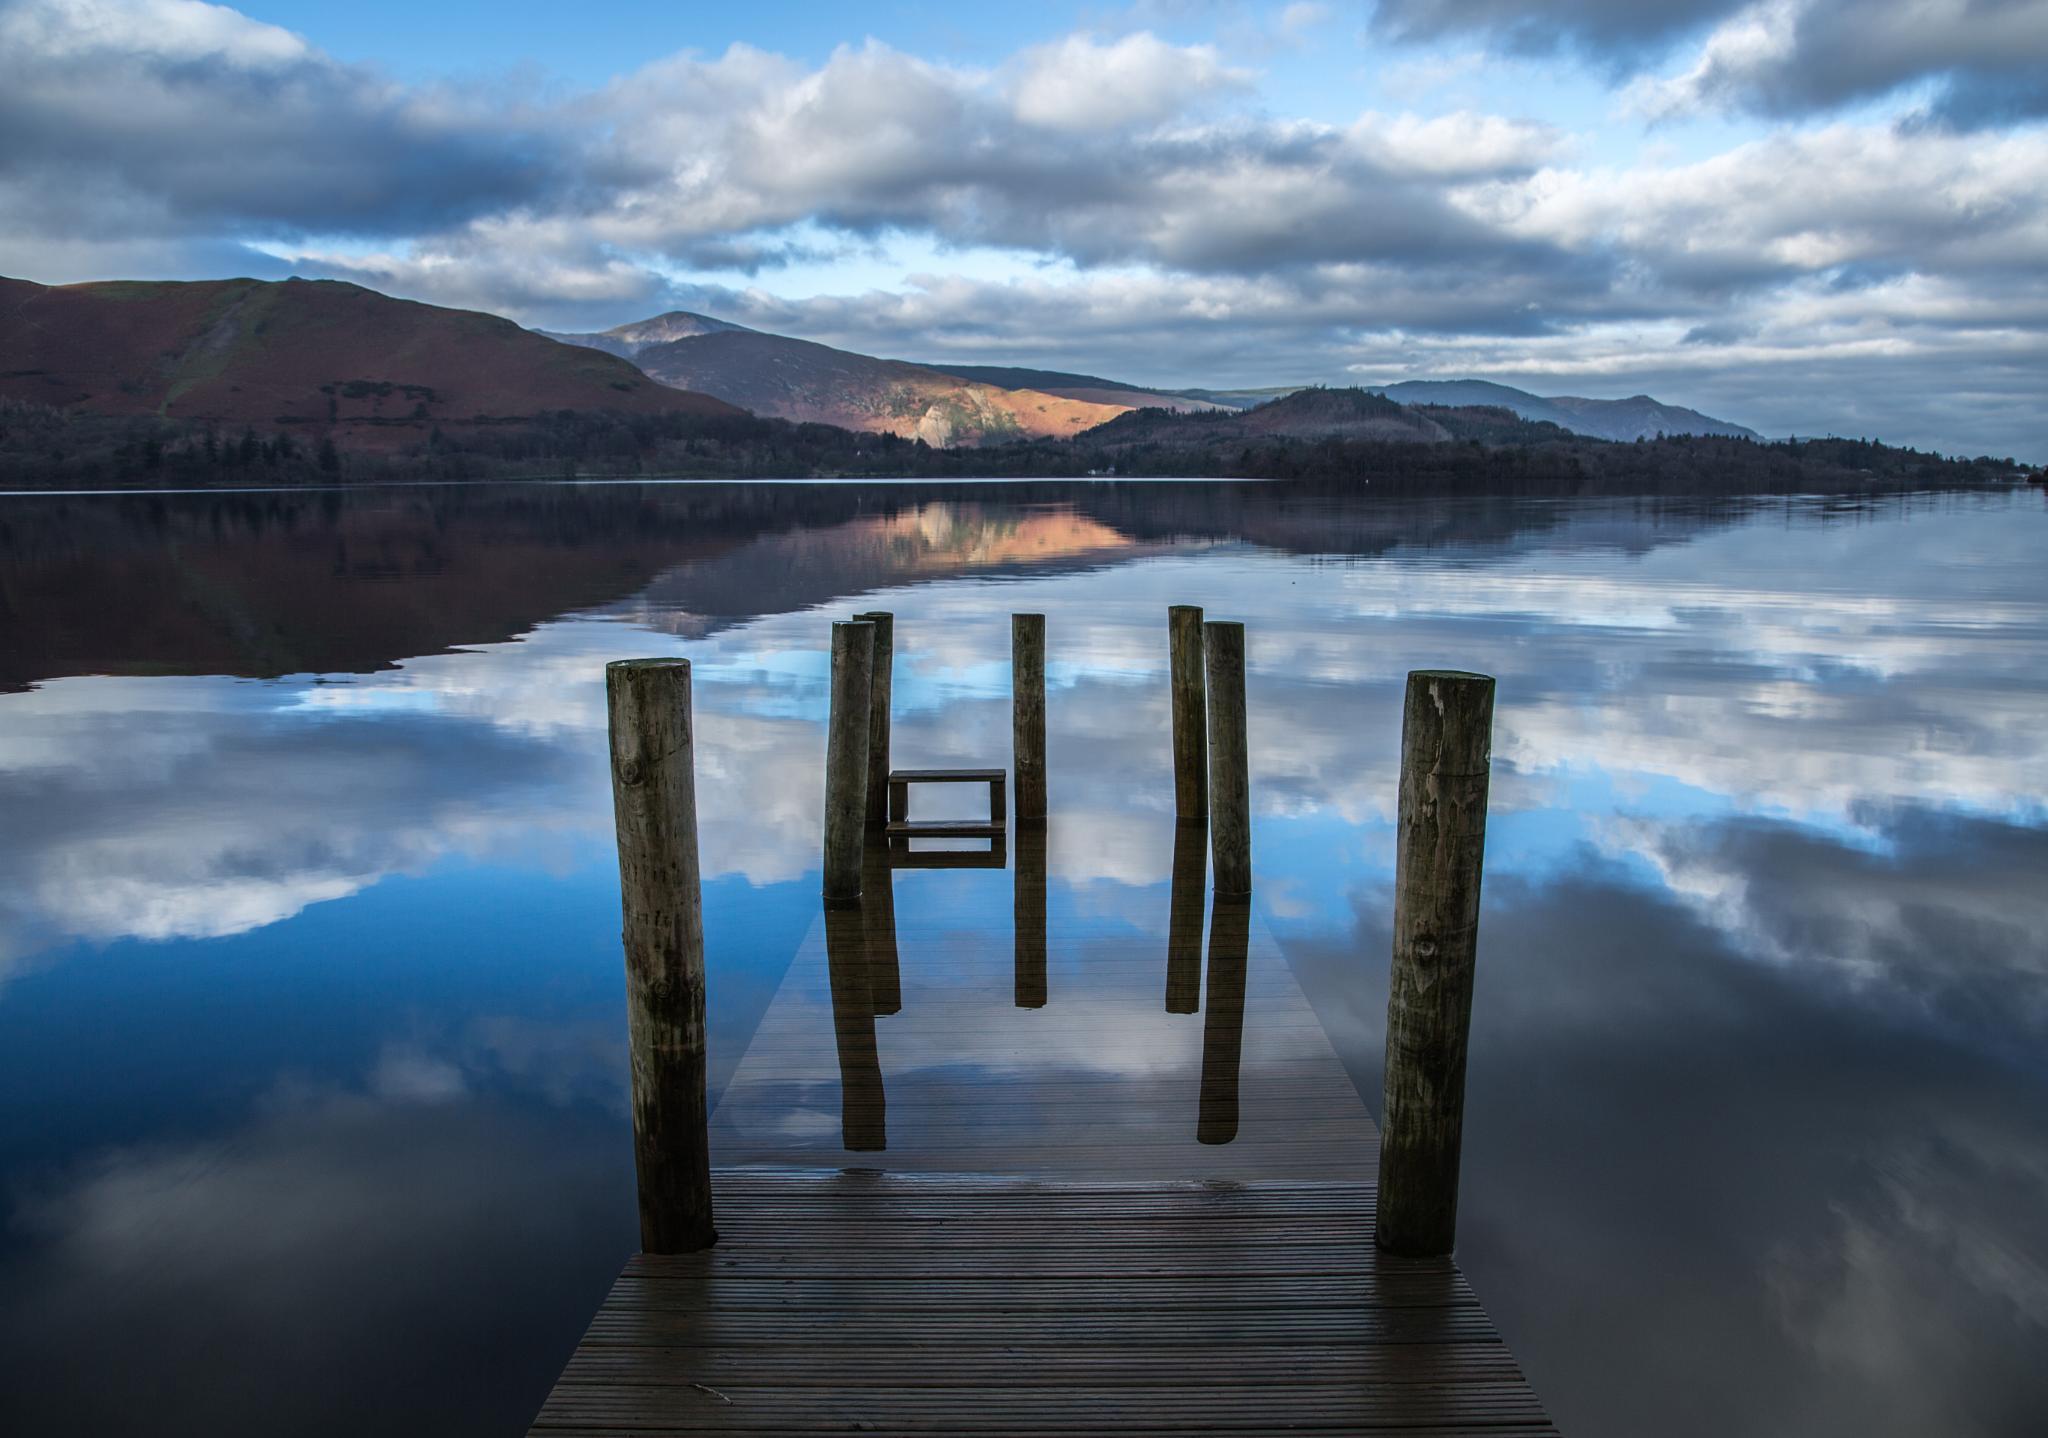 Derwent Water Lake District by Chris Taylor